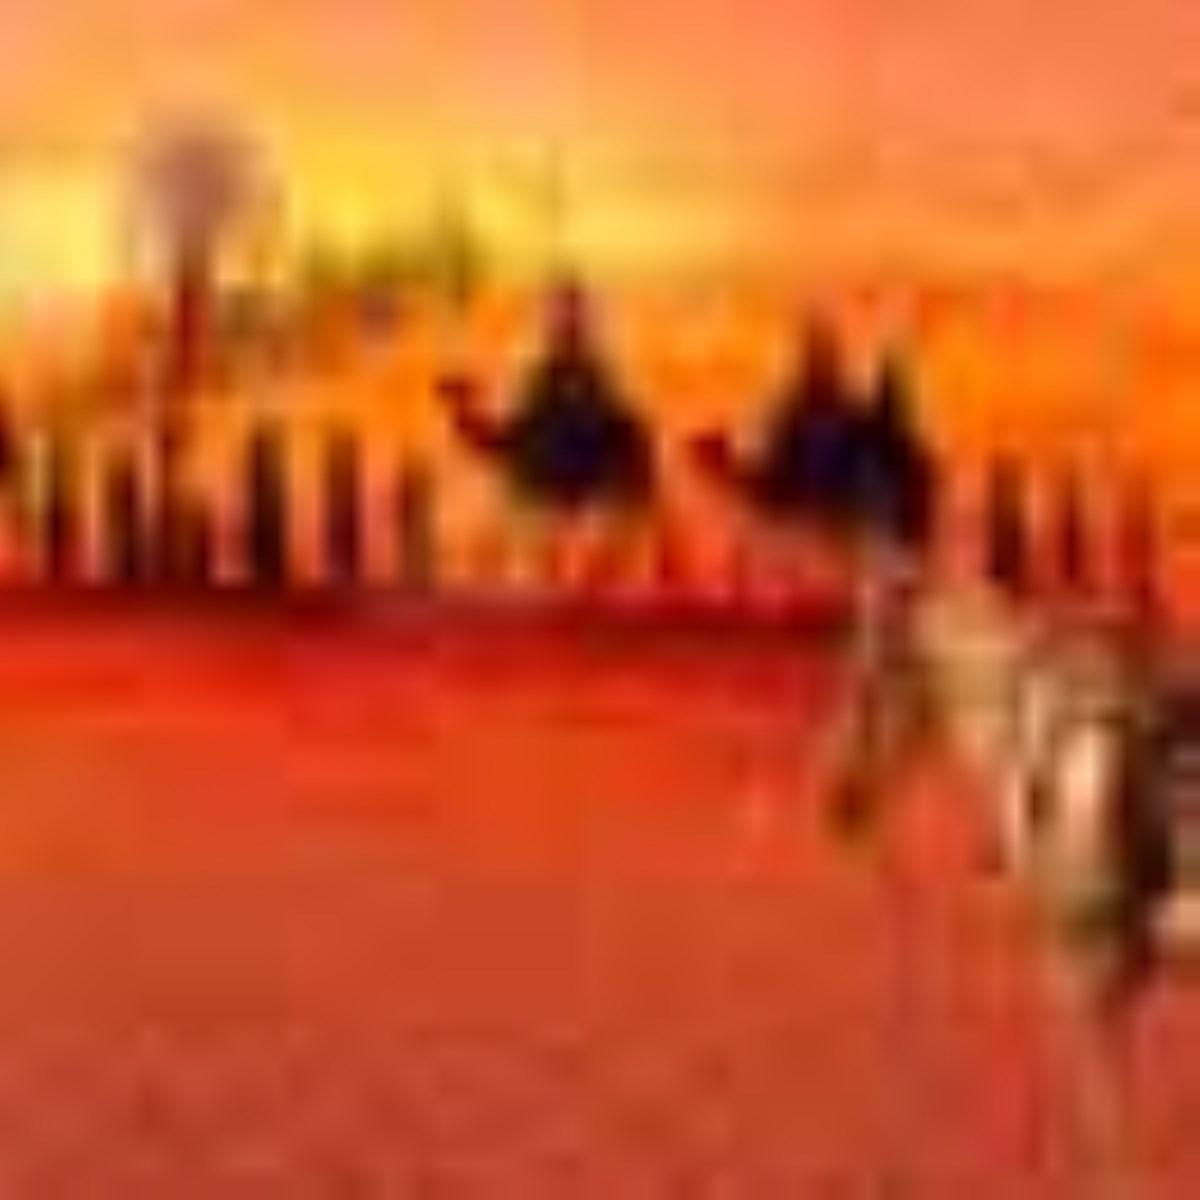 فرزندان و اهلبيت امام حسين(علیه السلام)